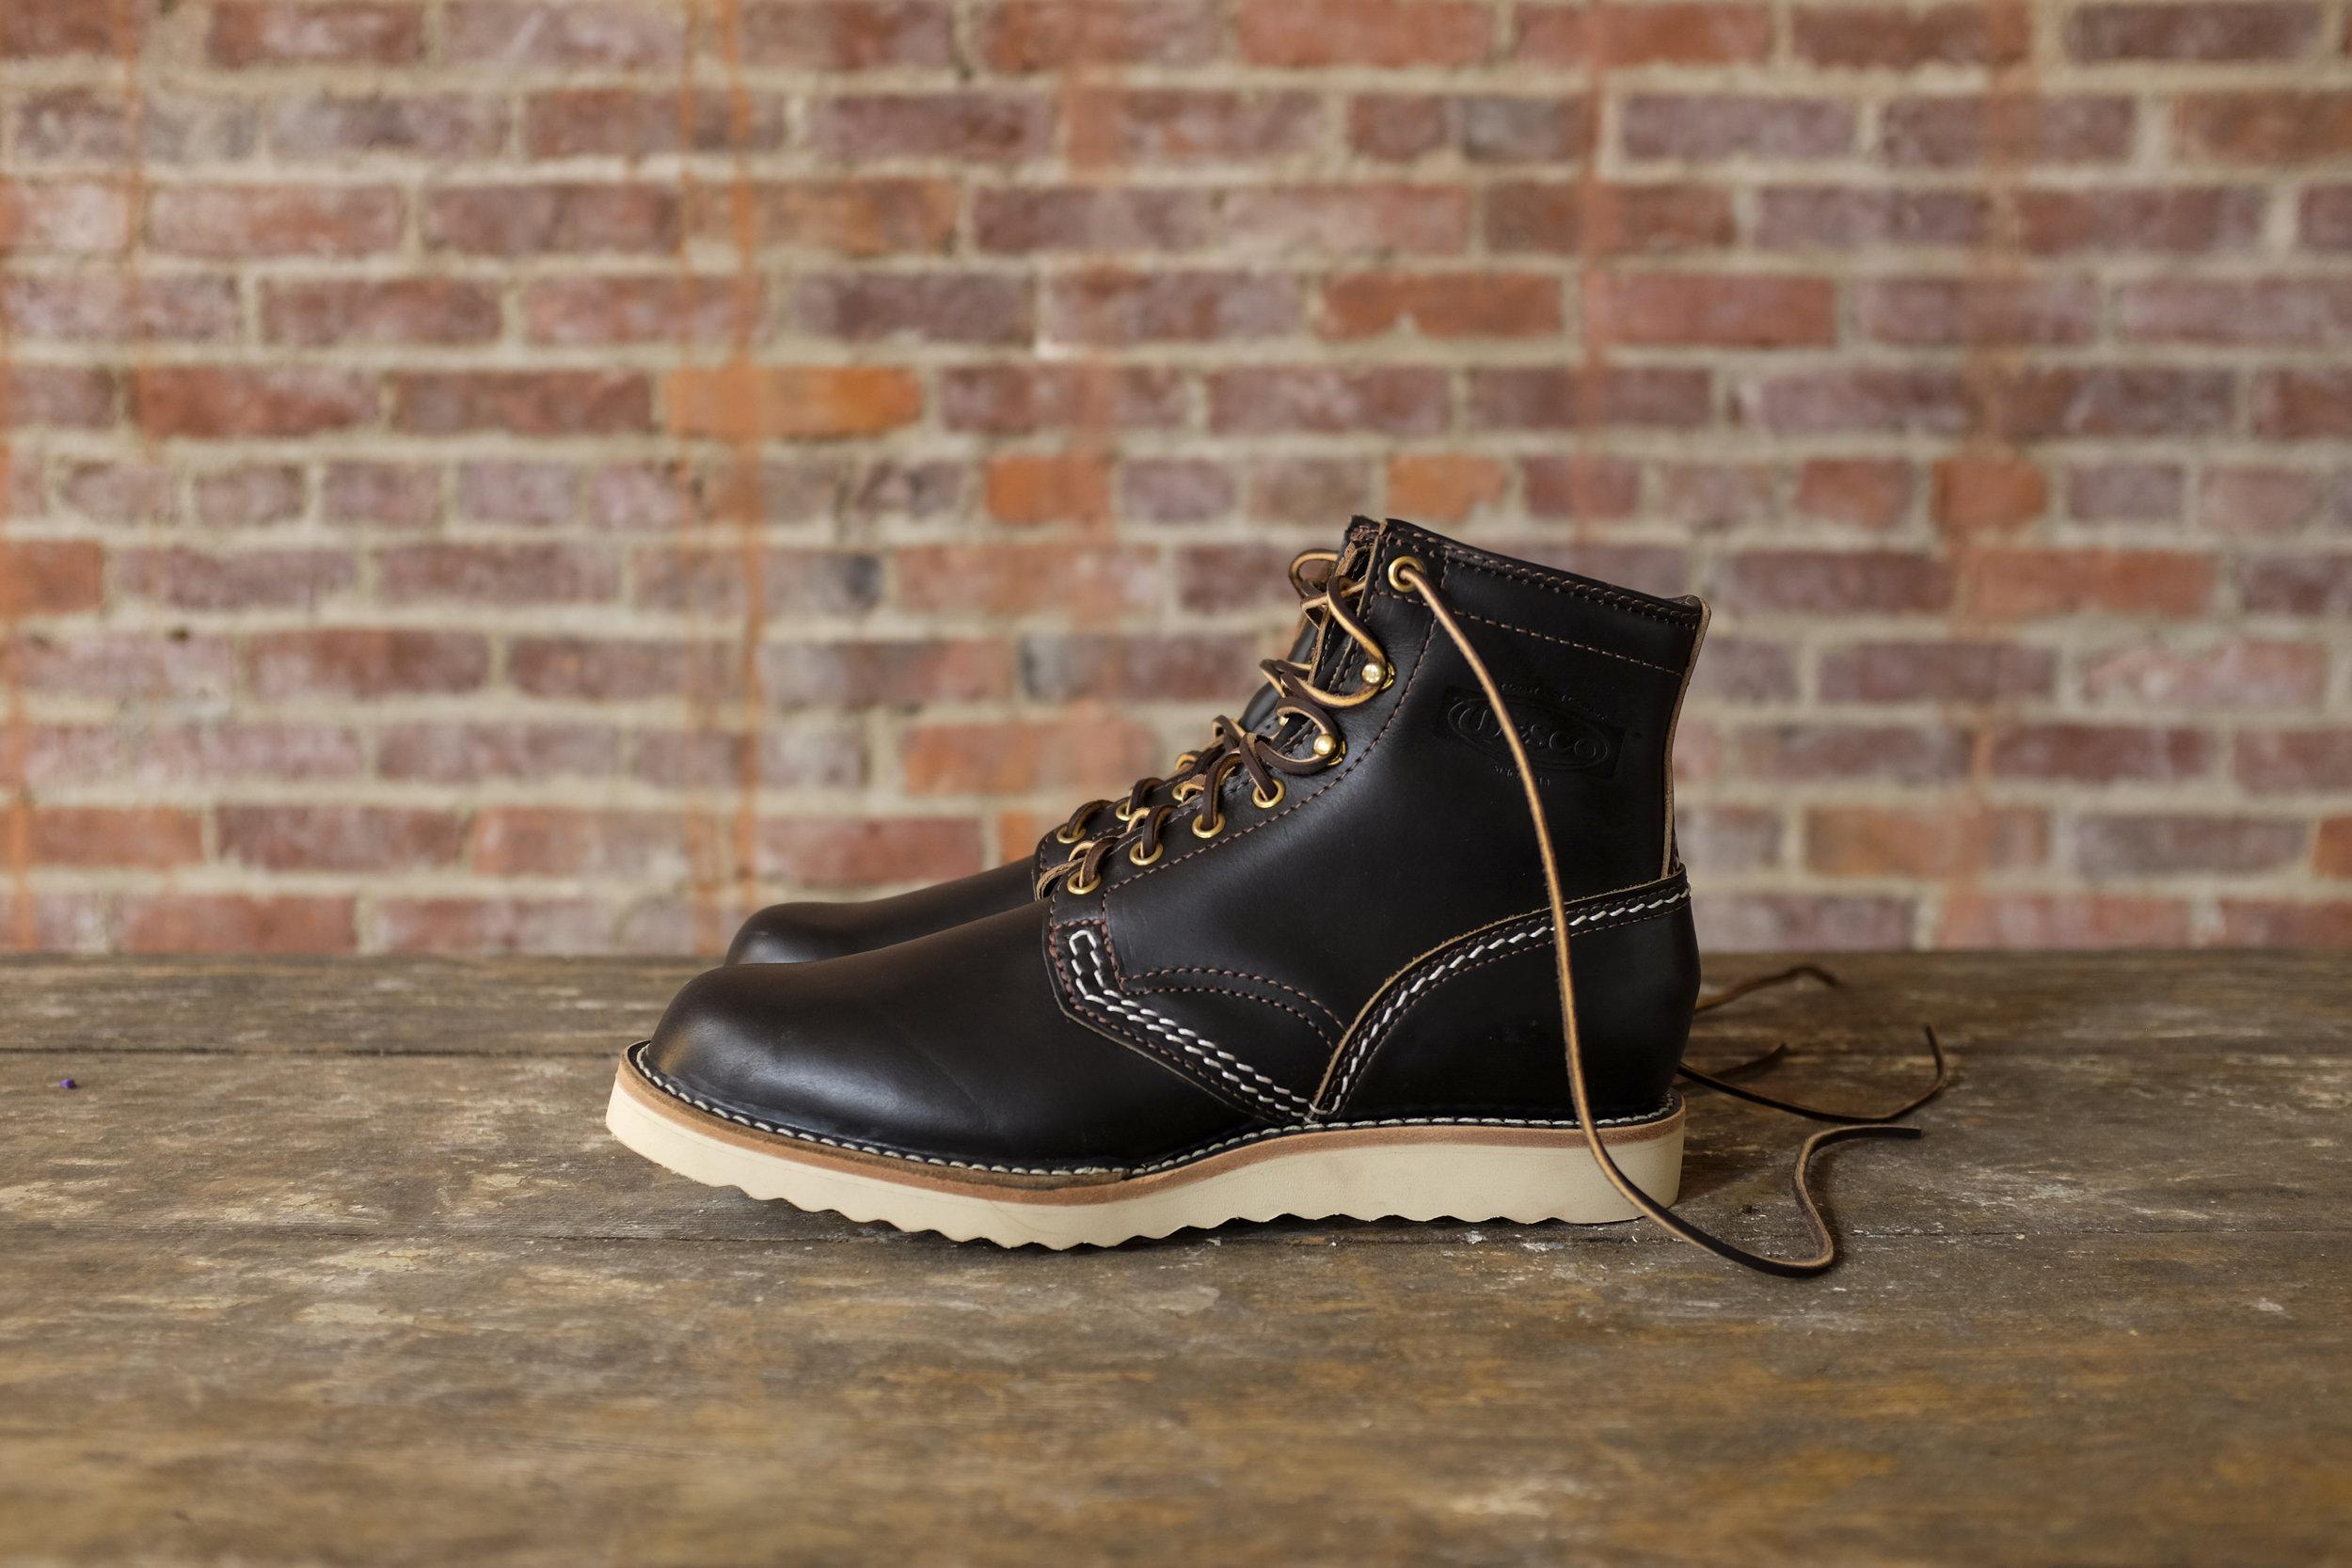 Black Bear Brand x Wesco Jobmaster in Horween Leather